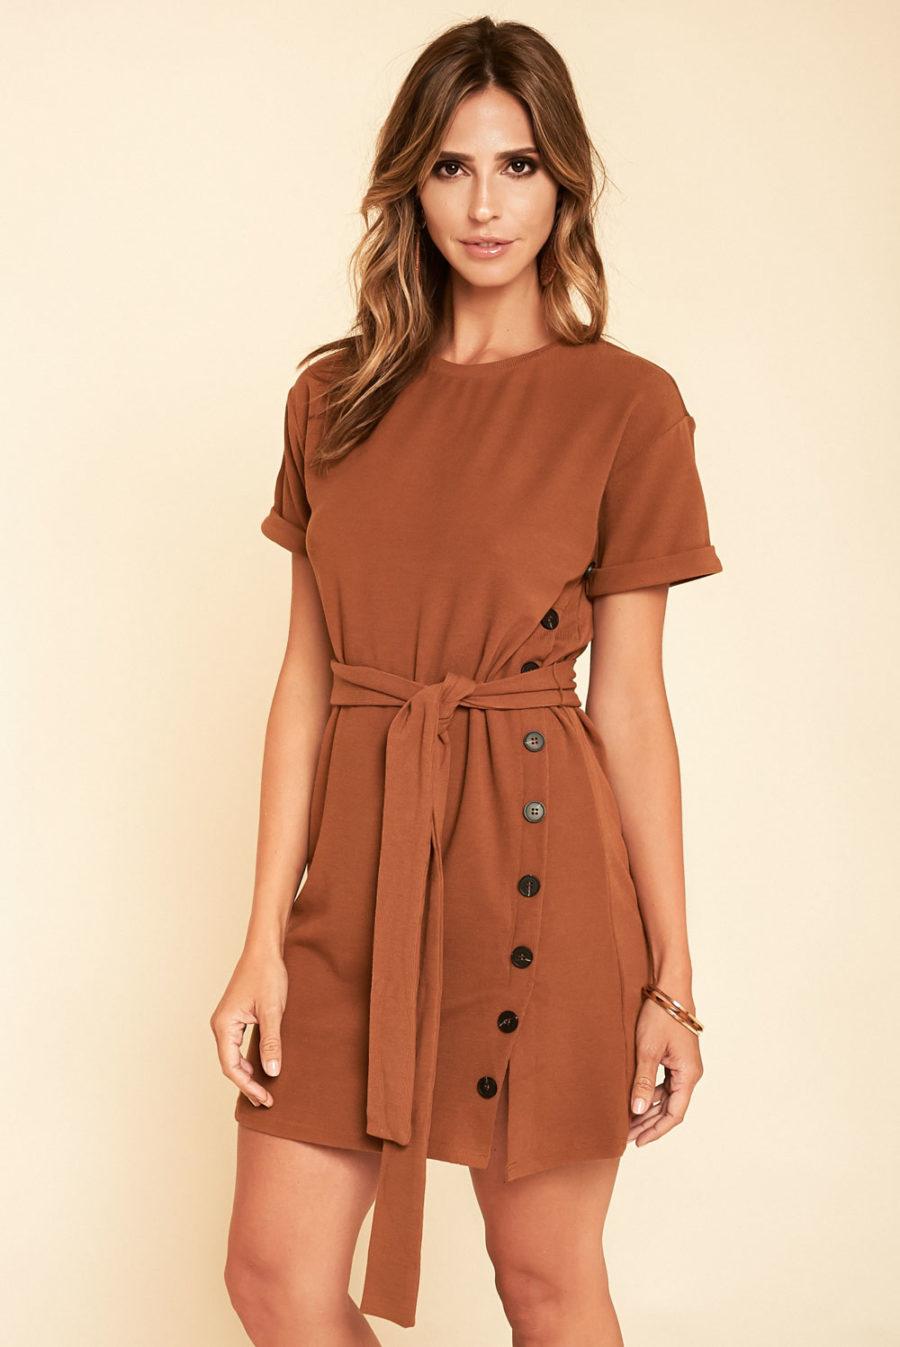 Sideshow Mini Dress